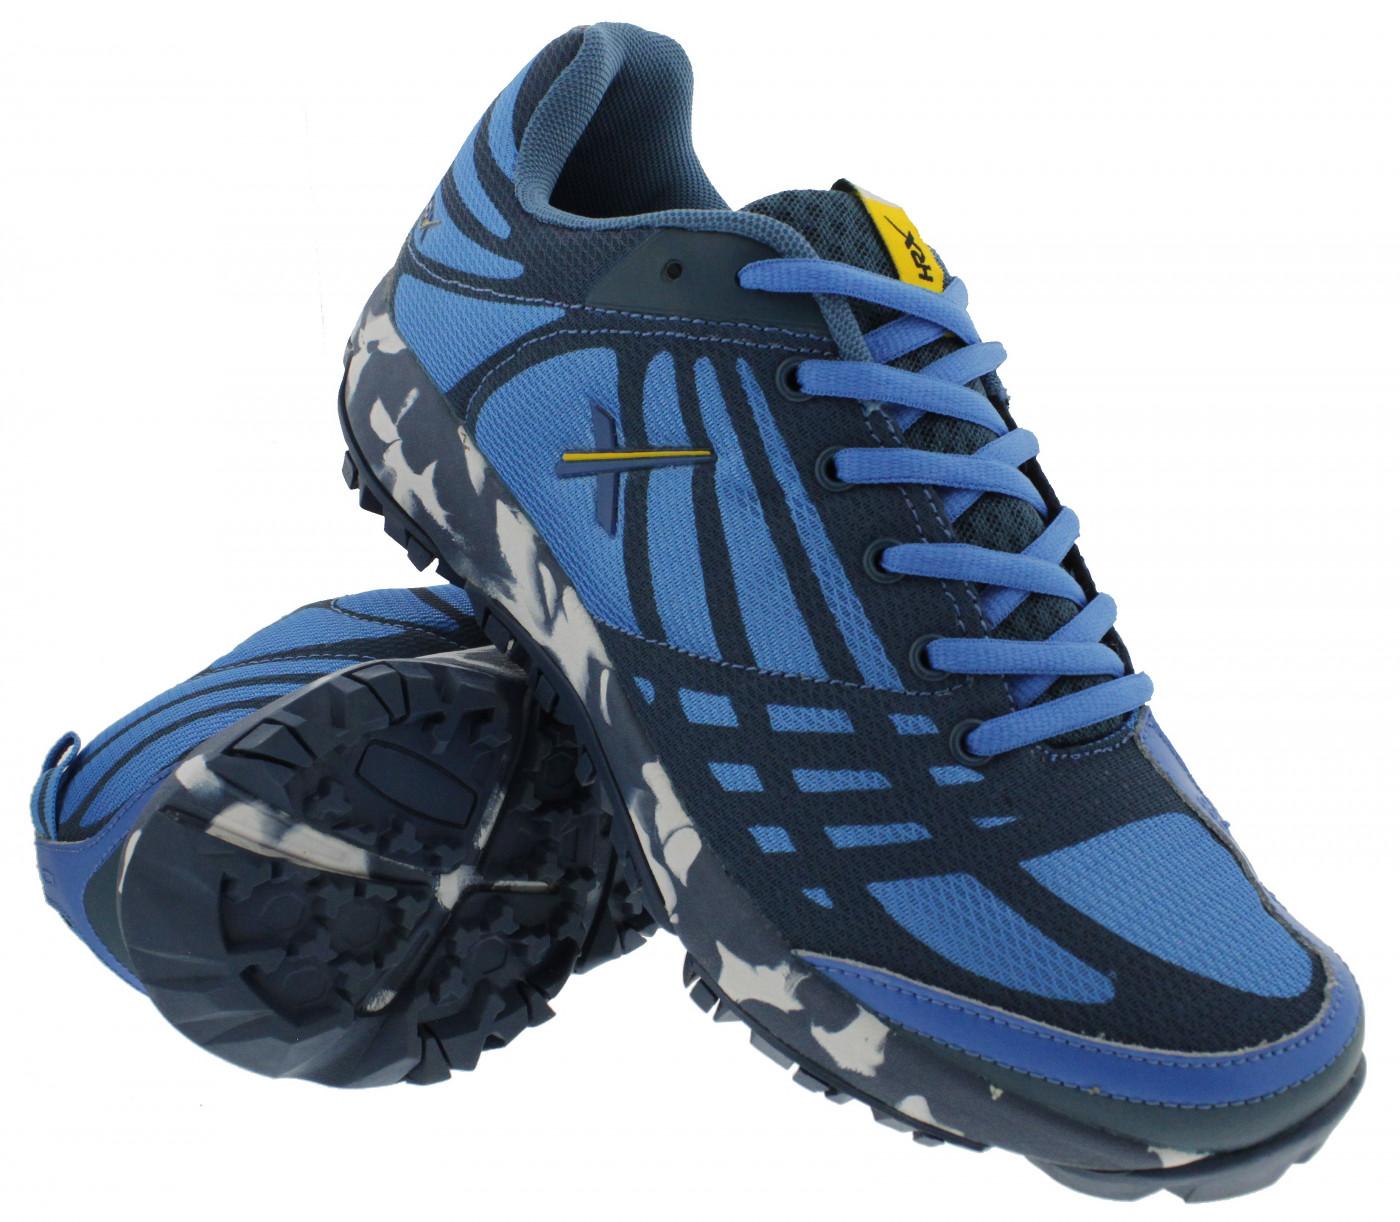 Kondor Man's Shoes MJ-9102A